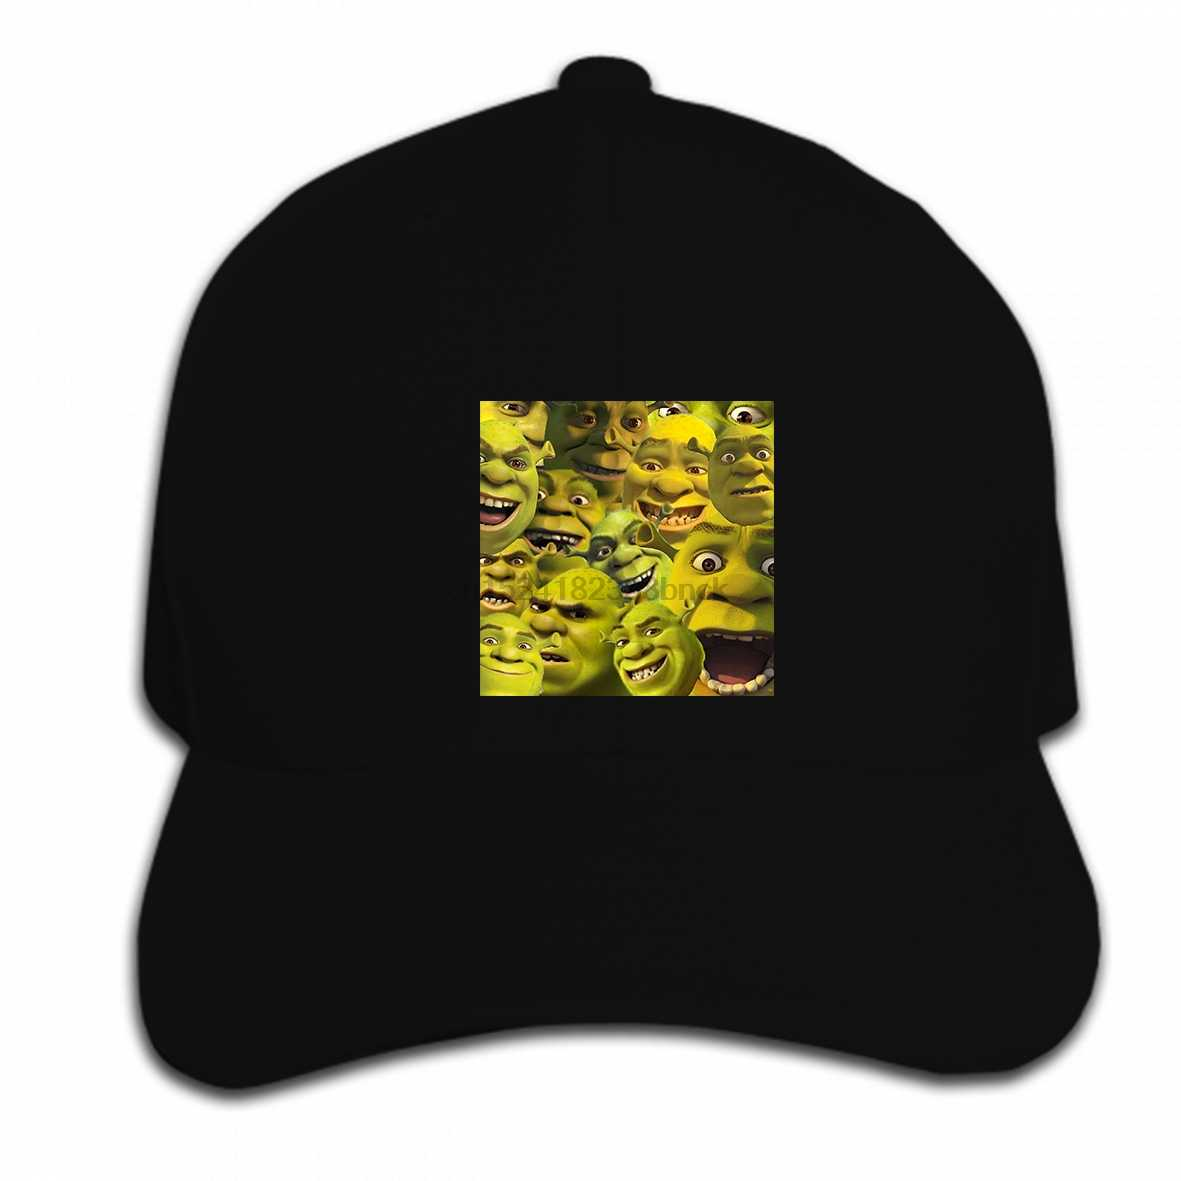 0927b592f9f7c Detail Feedback Questions about Print Custom Baseball Cap Hip Hop Men Shrek  Collection Women Hat Peaked cap on Aliexpress.com